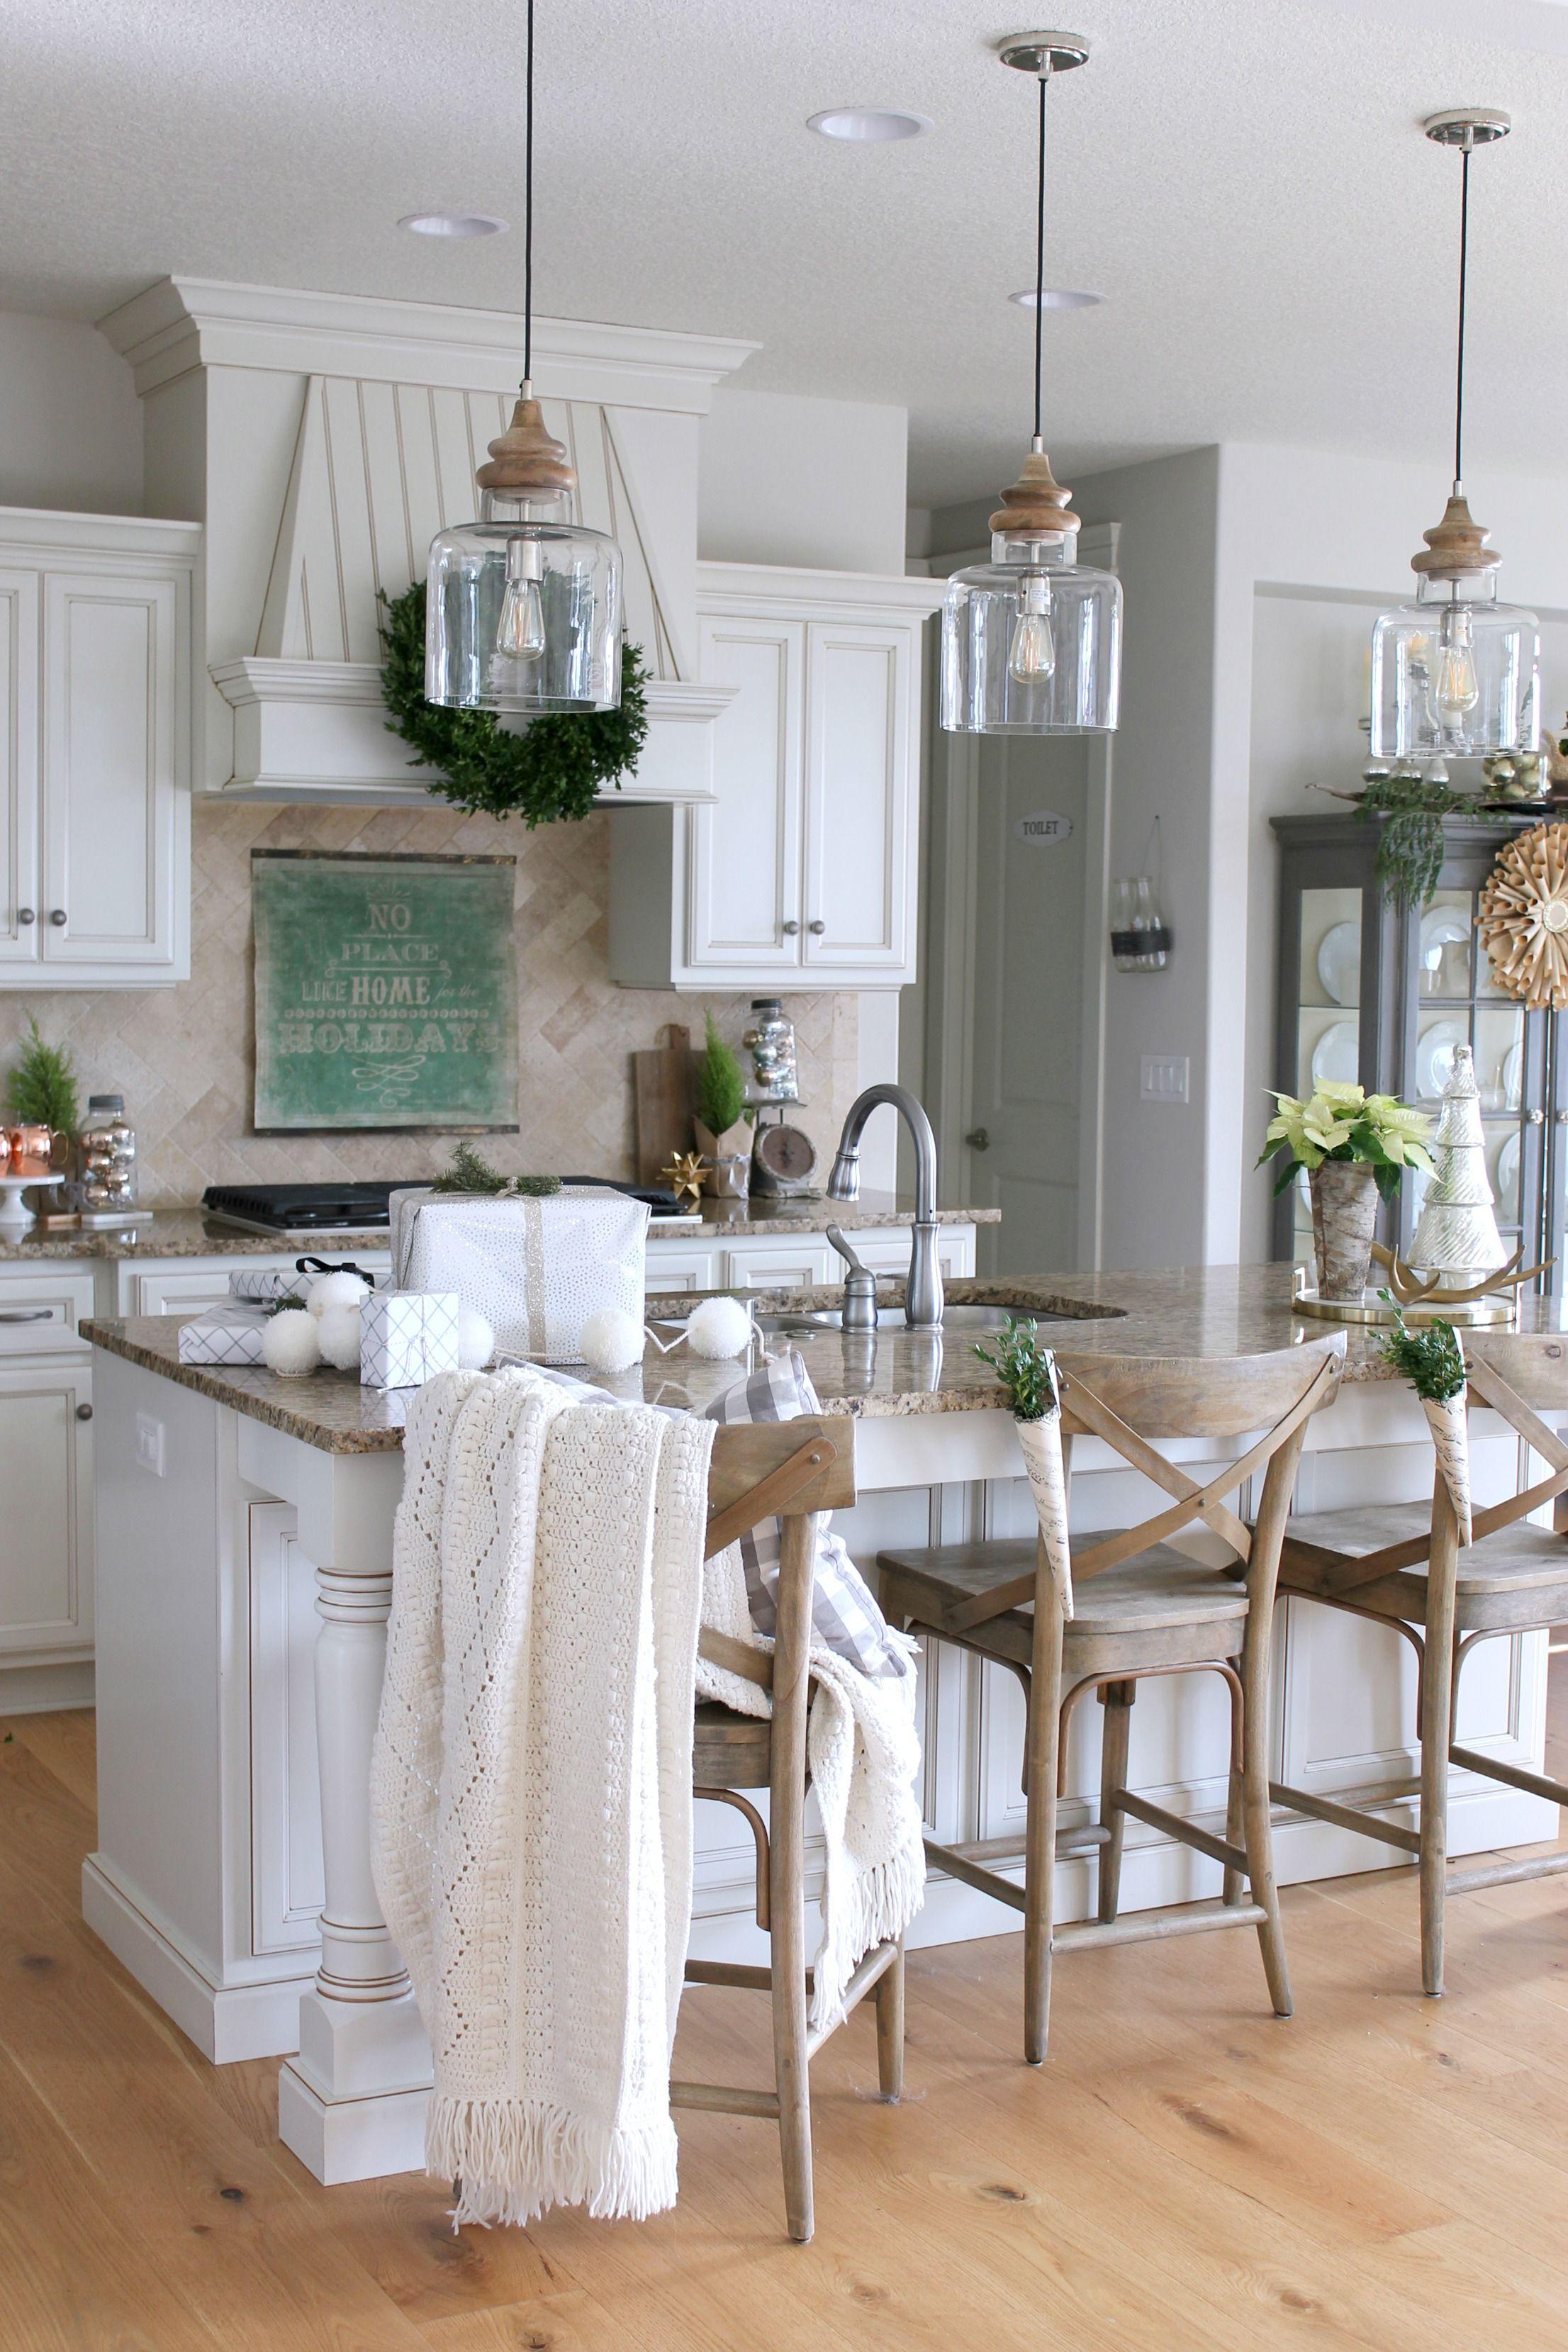 New Farmhouse Style Island Pendant Lights | Kitchens ...